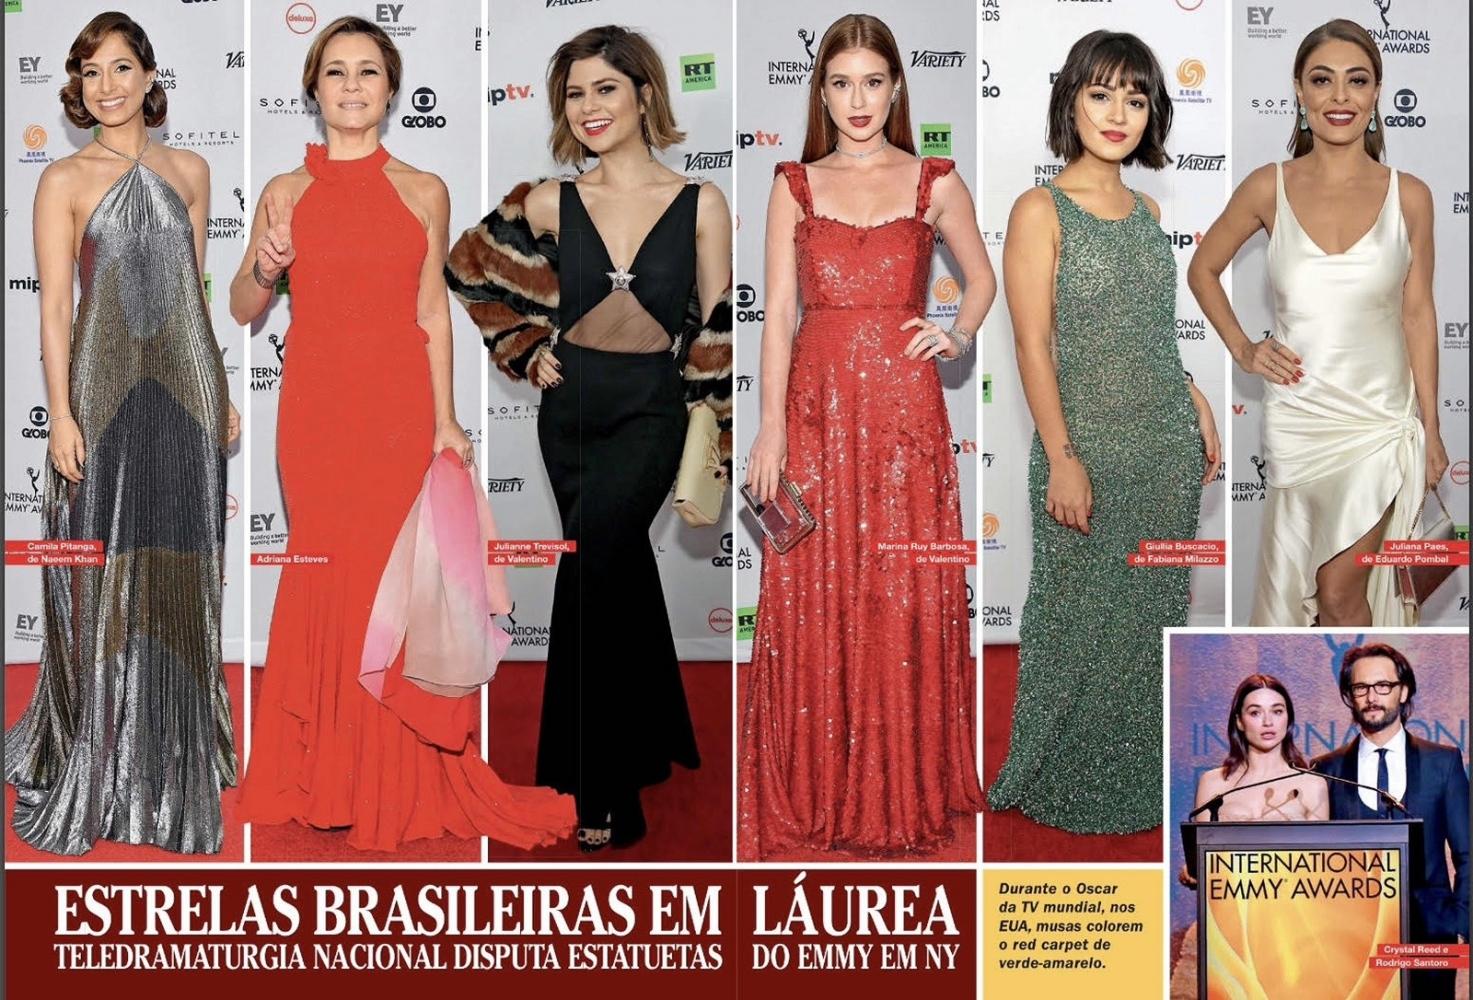 Caras Magazine